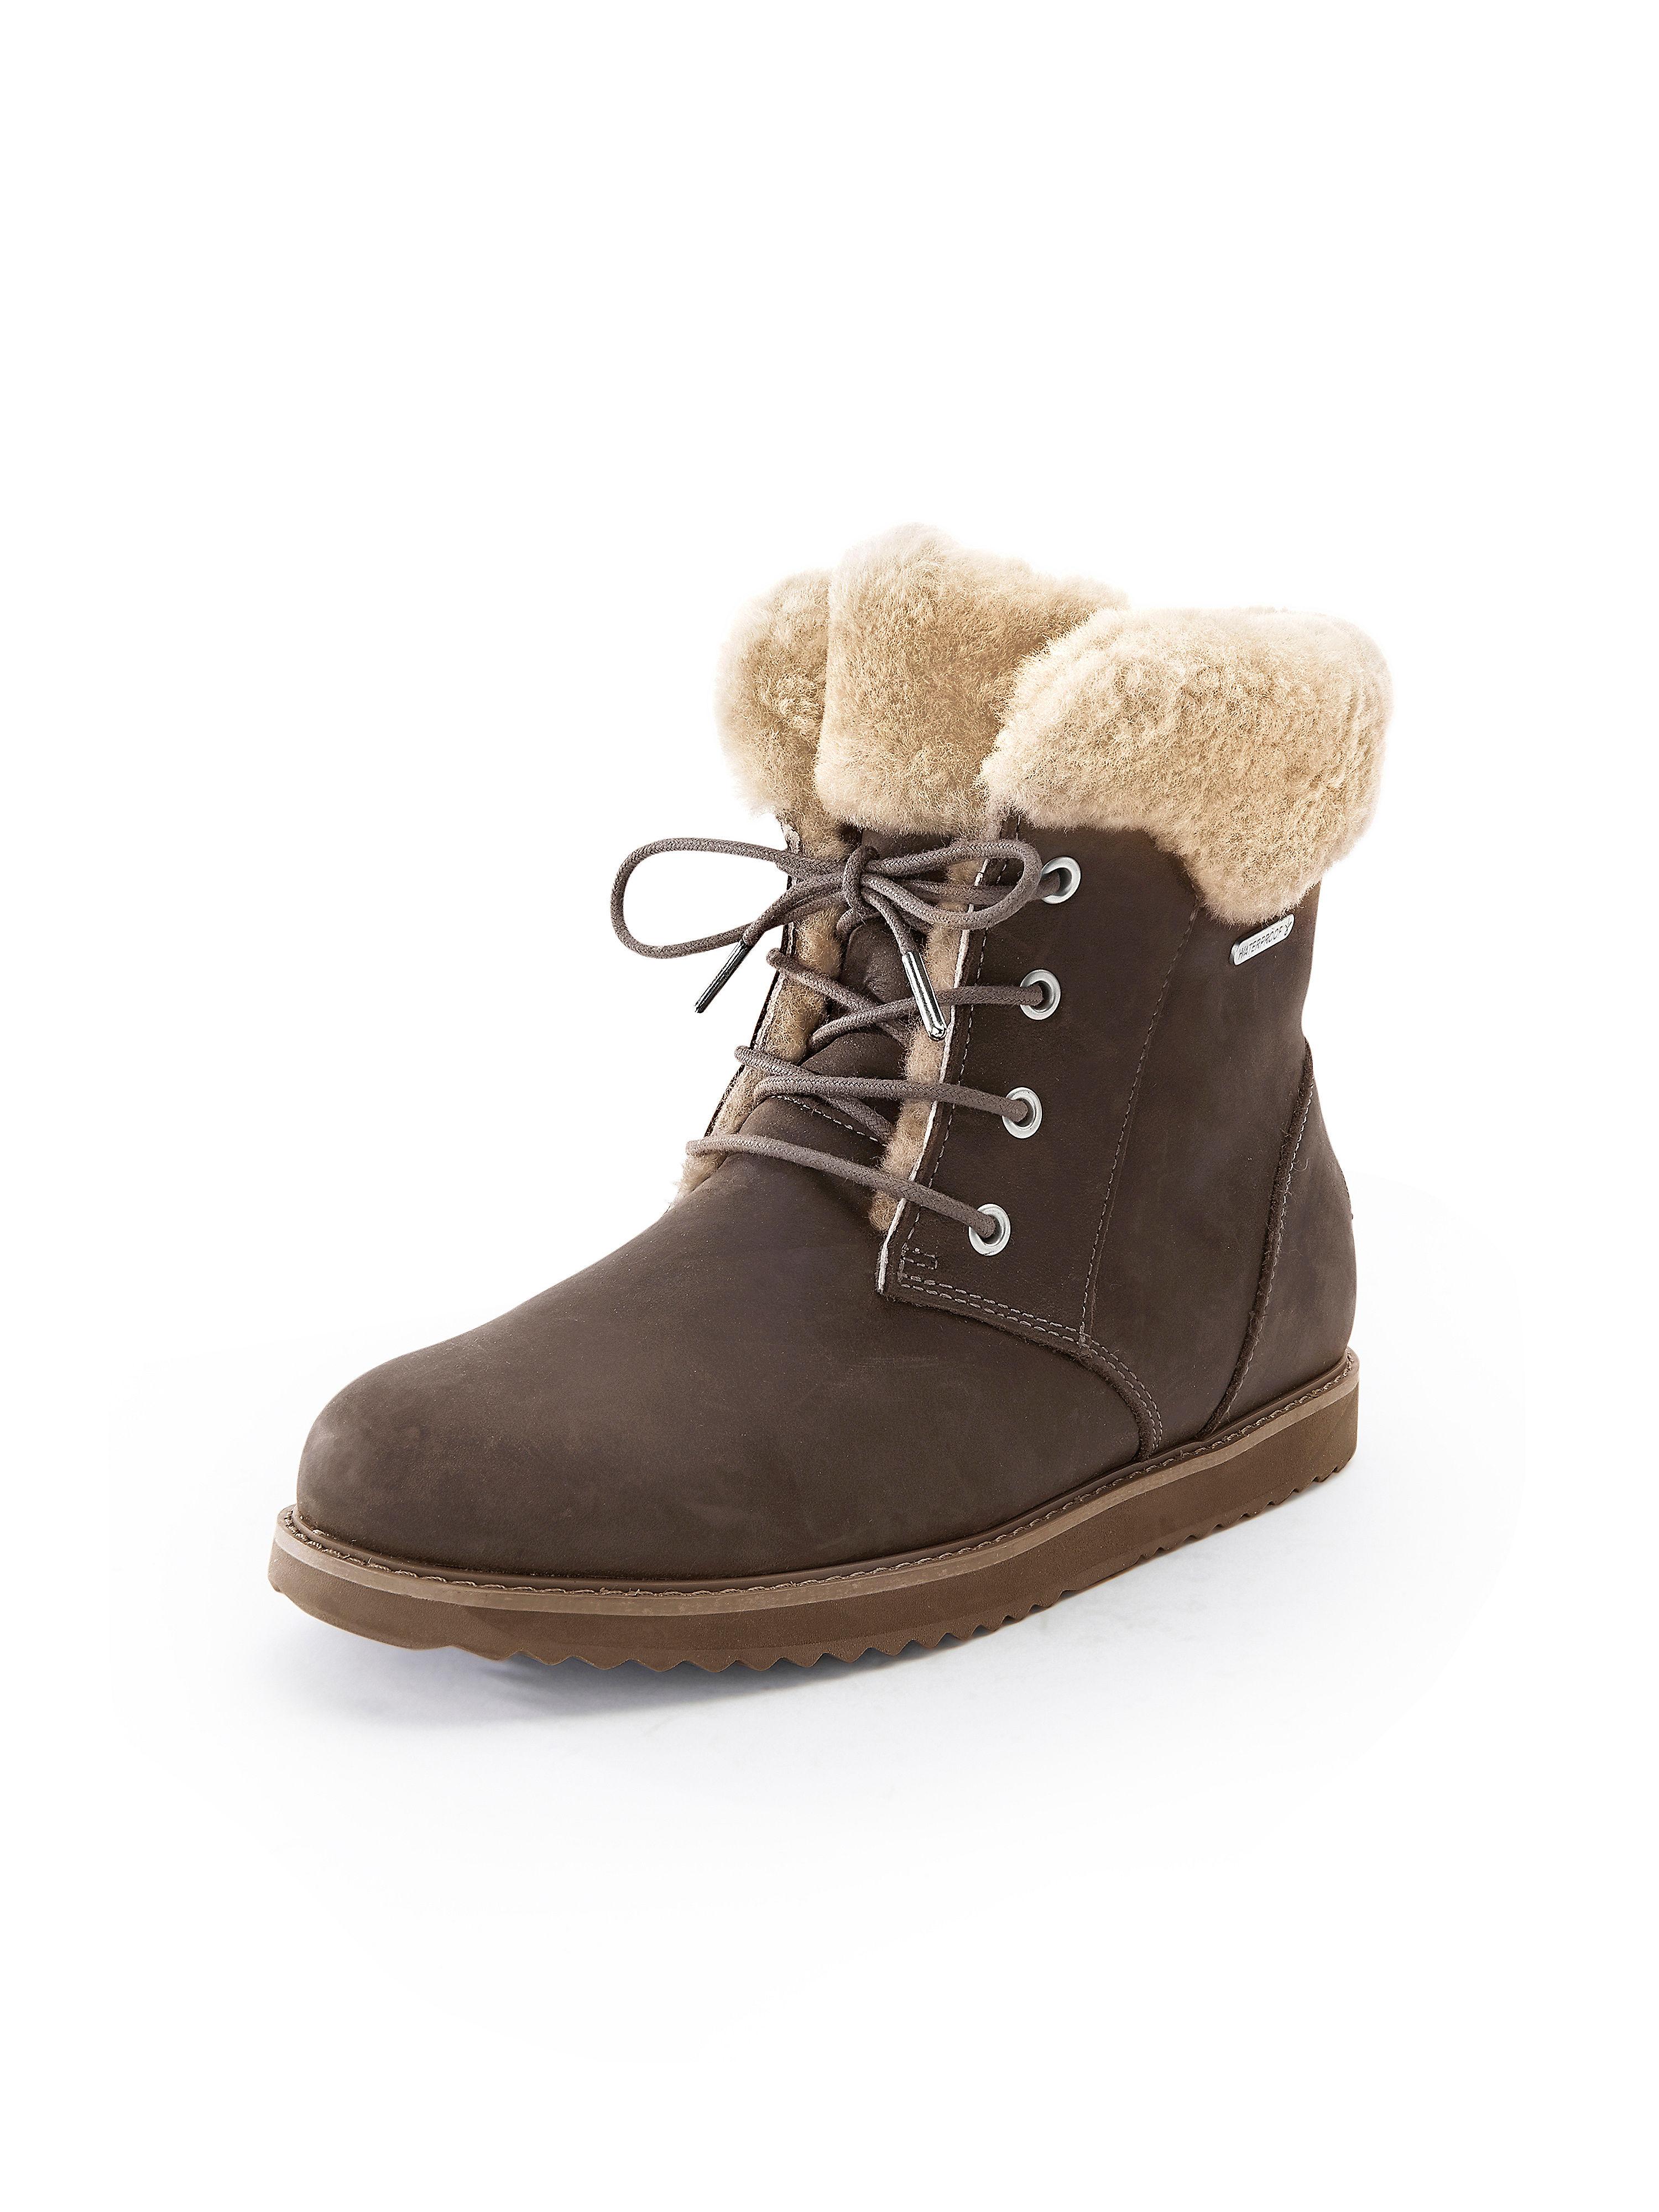 Les bottines 100% cuir  Emu marron taille 37